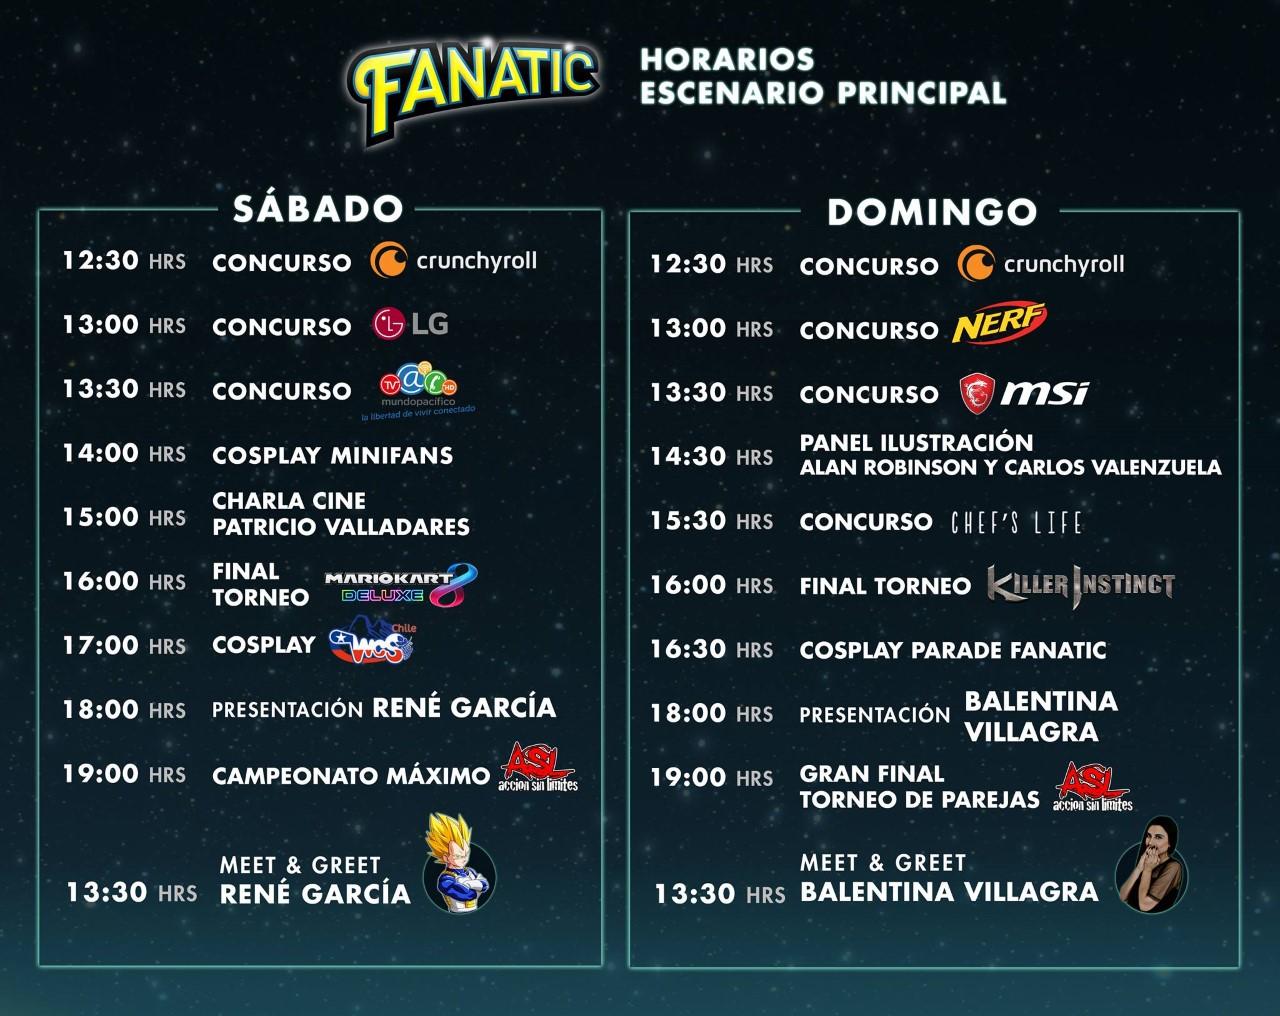 Fanatic 2017